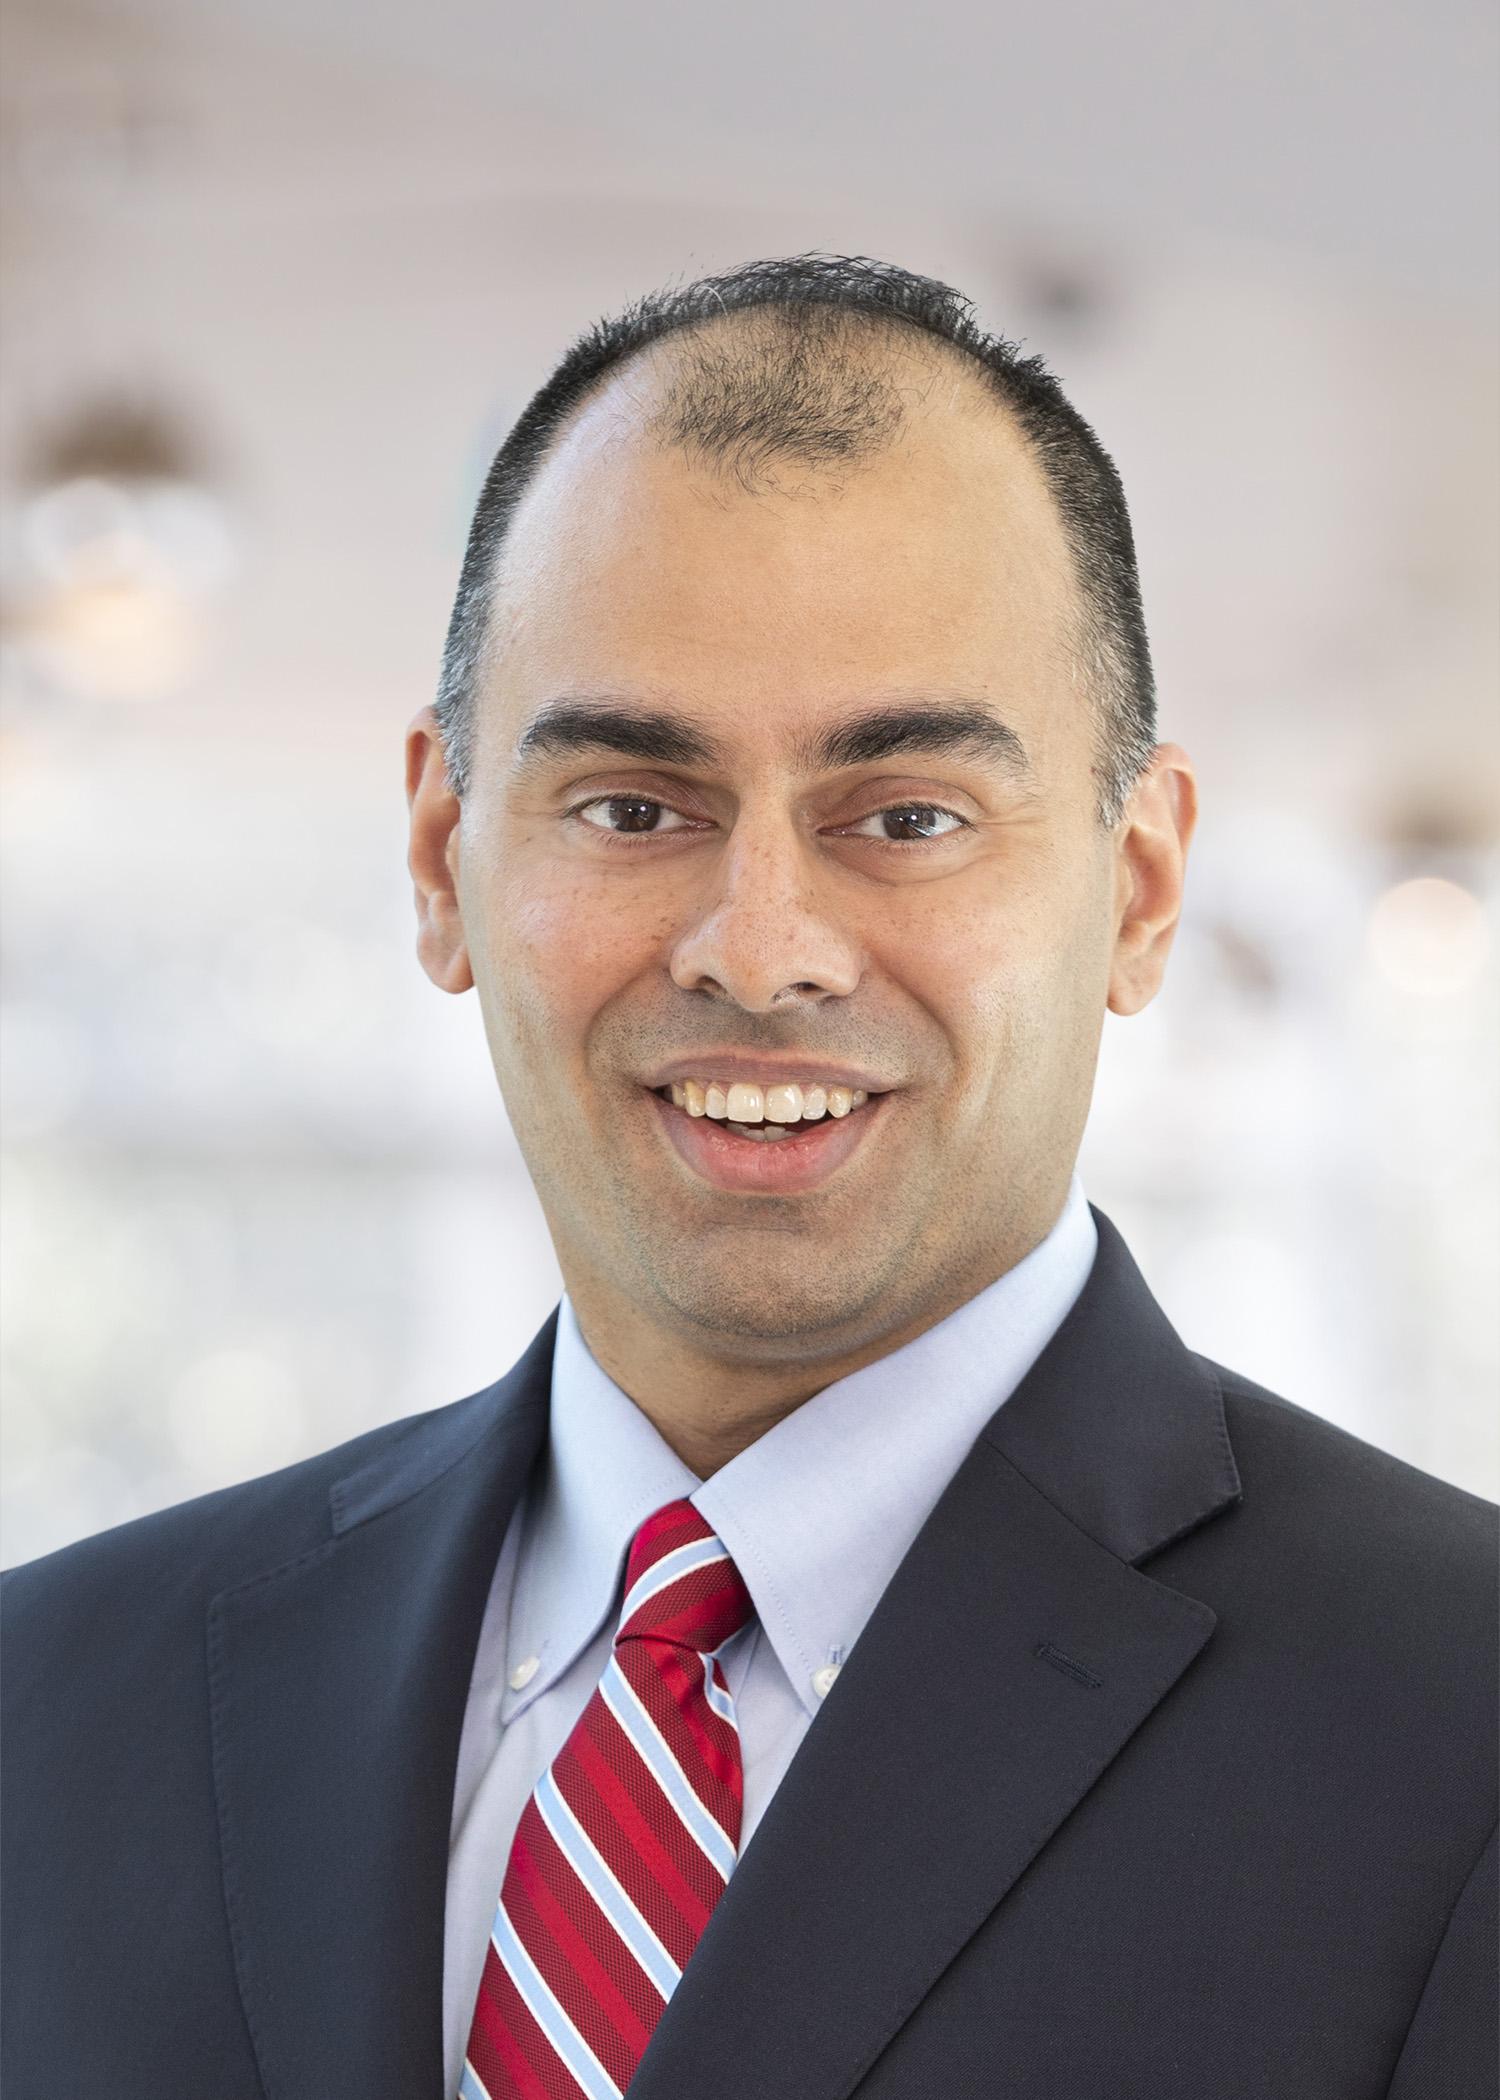 Dr. Sumeet Chhabra